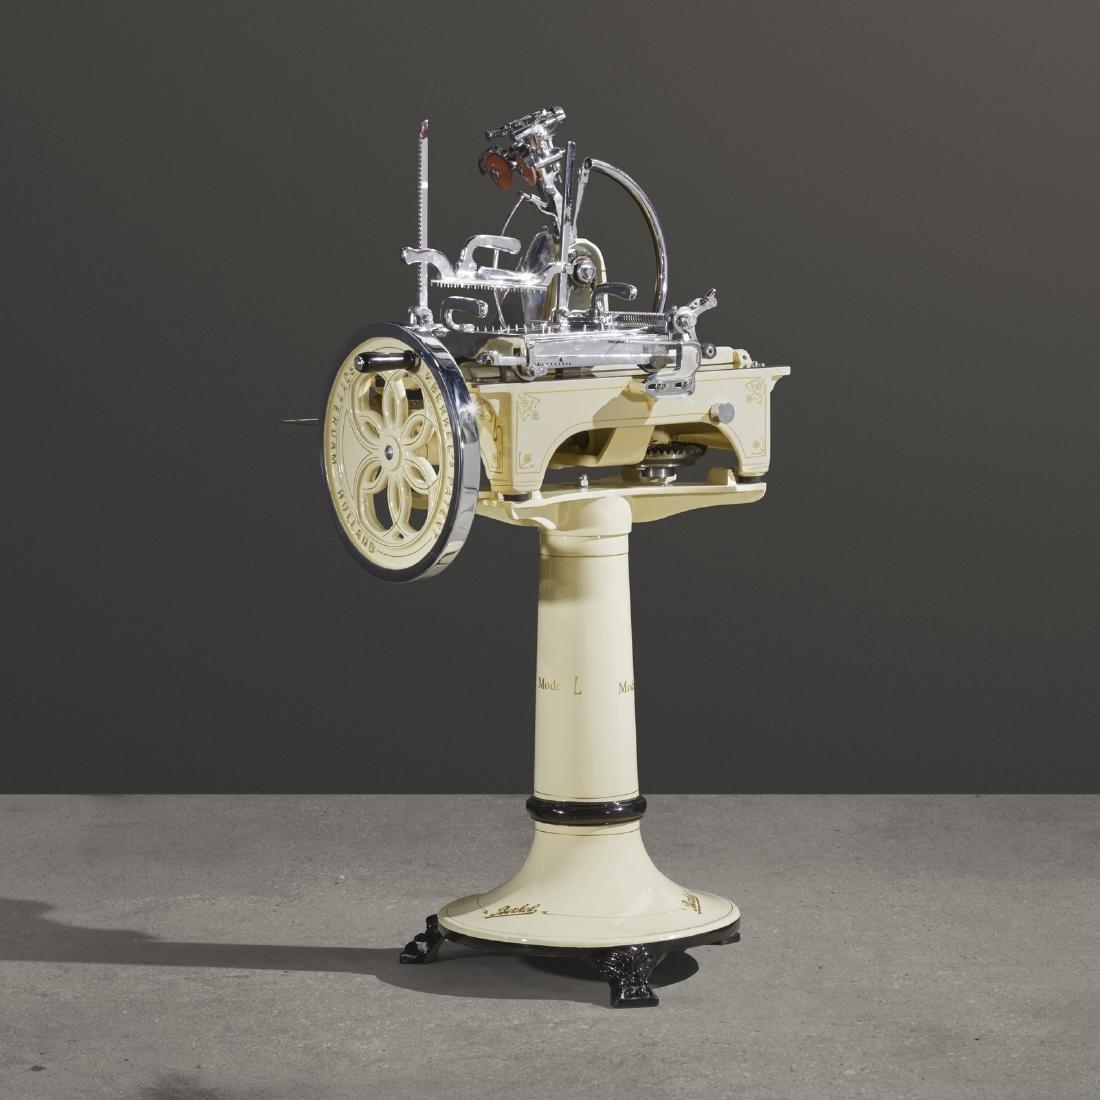 Berkel, Flywheel slicer, model L